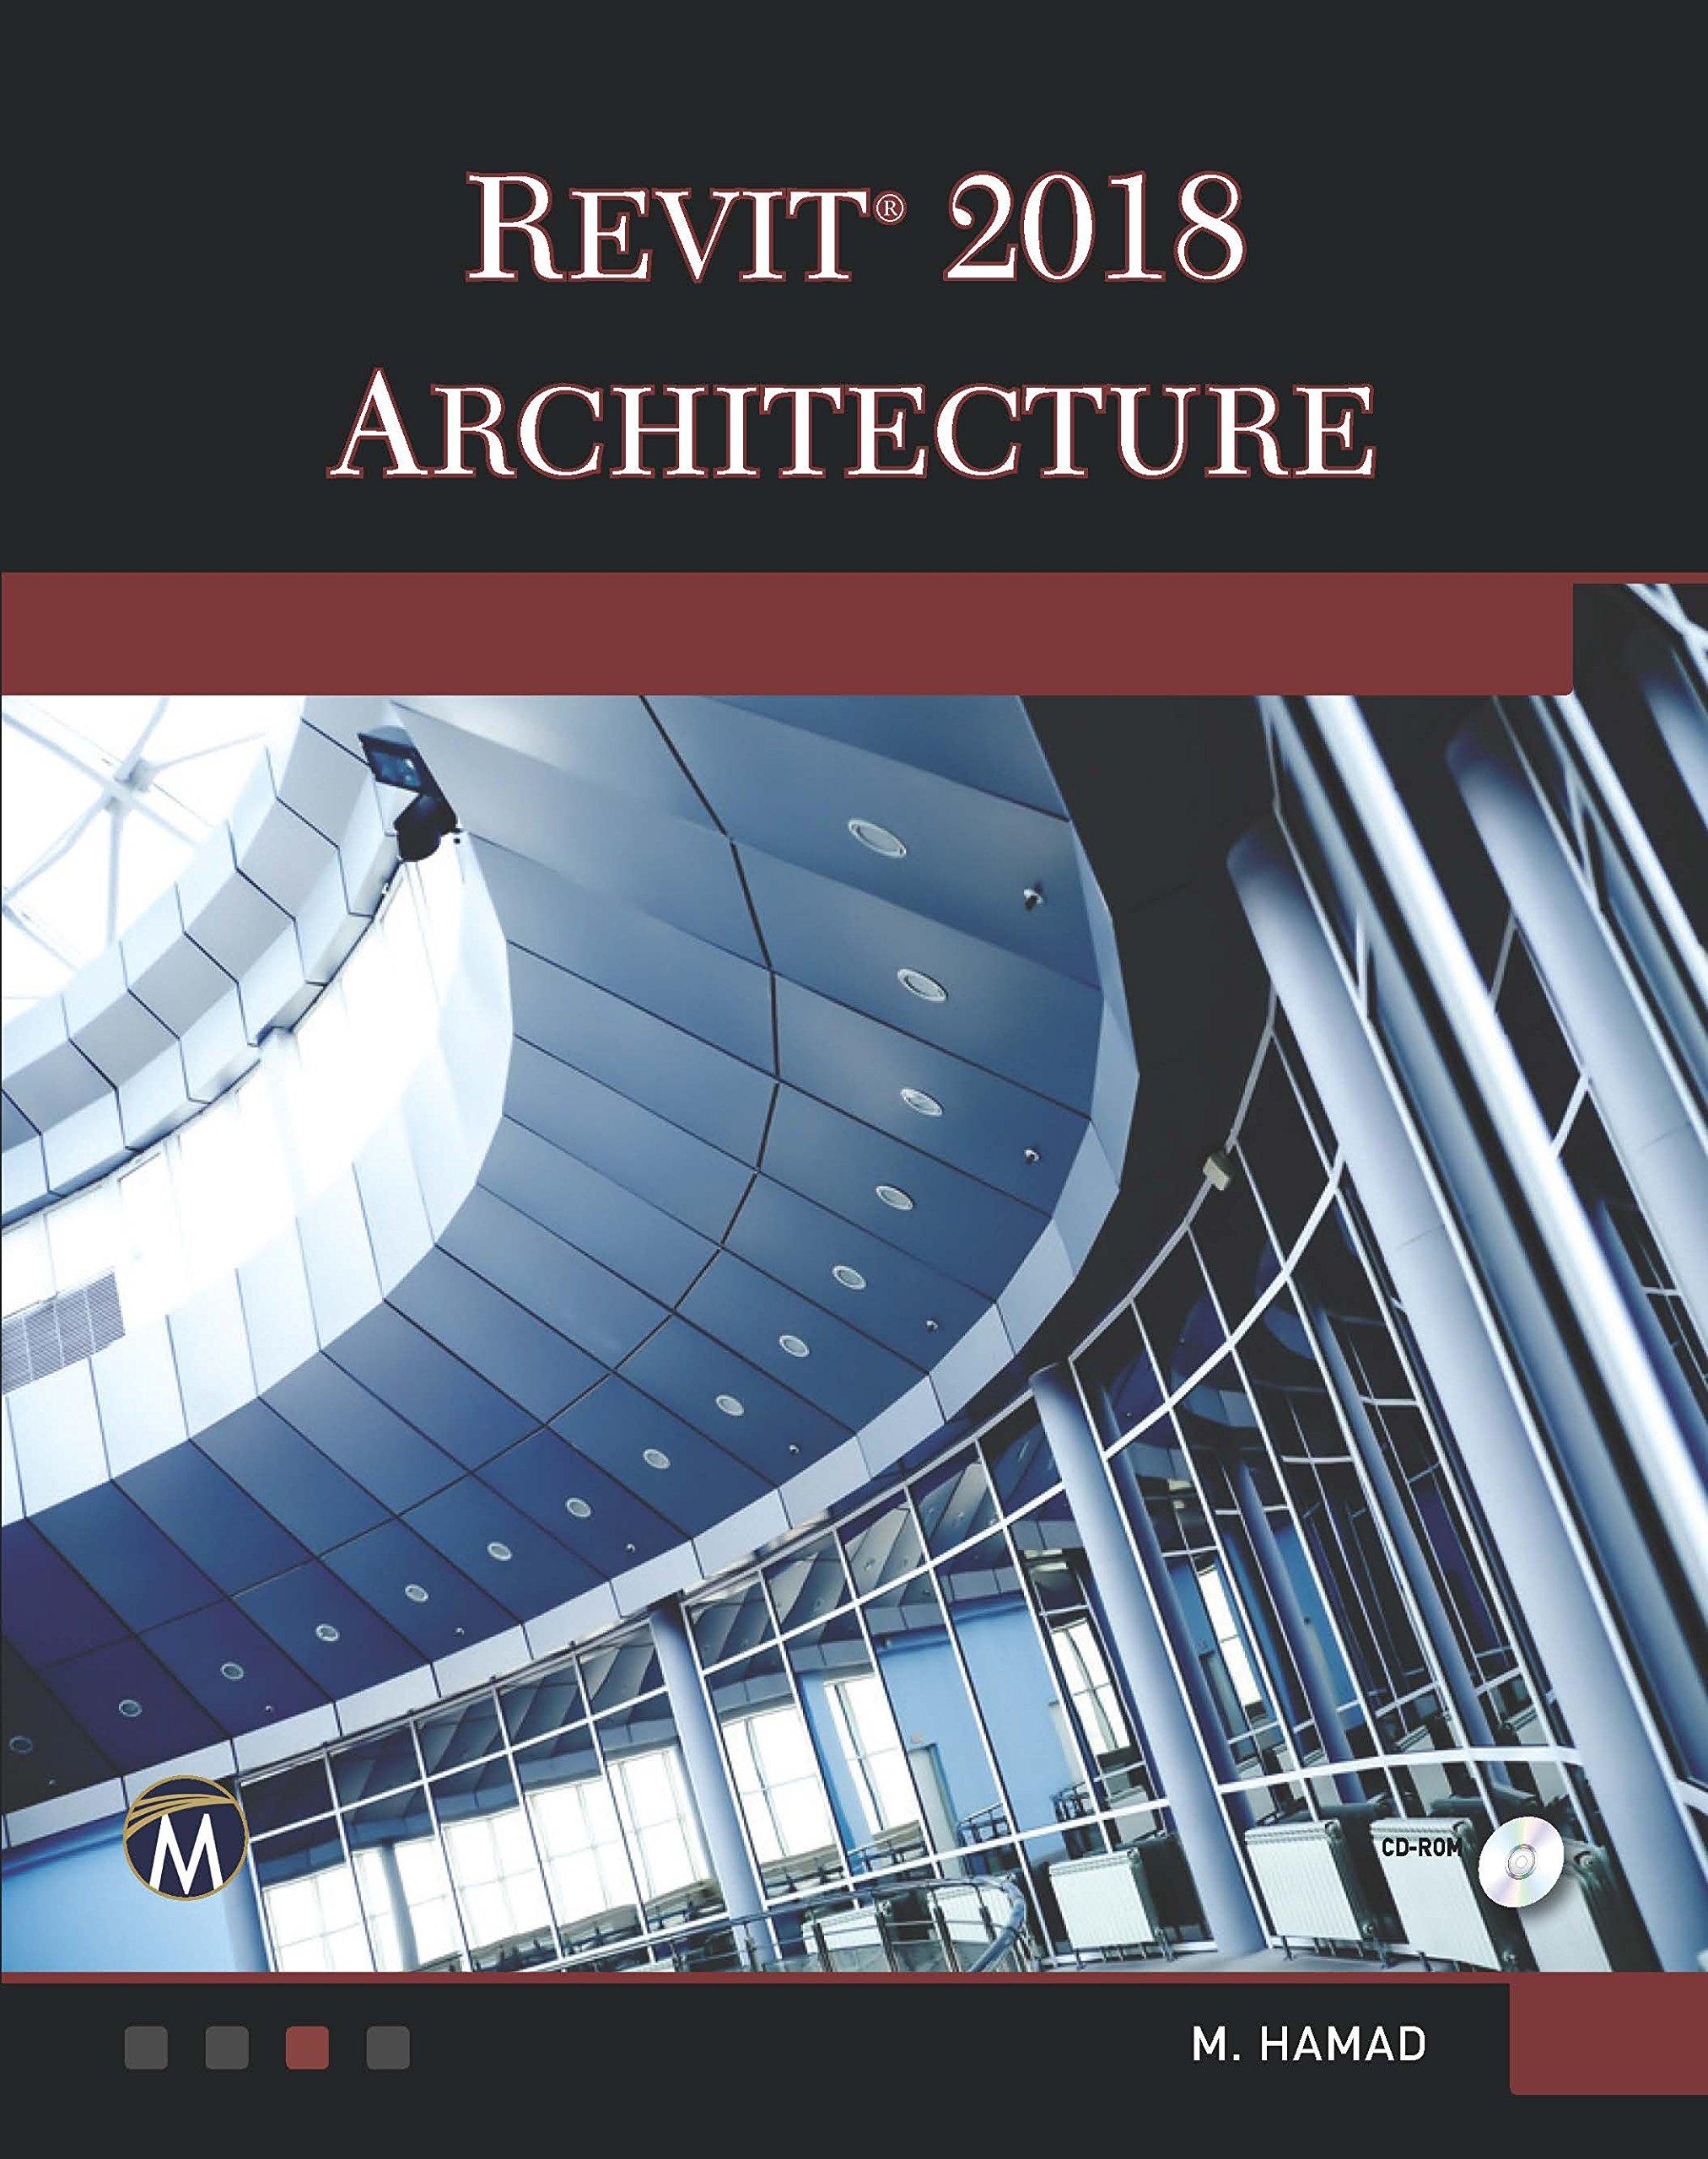 Revit 2018 Architecture ebook